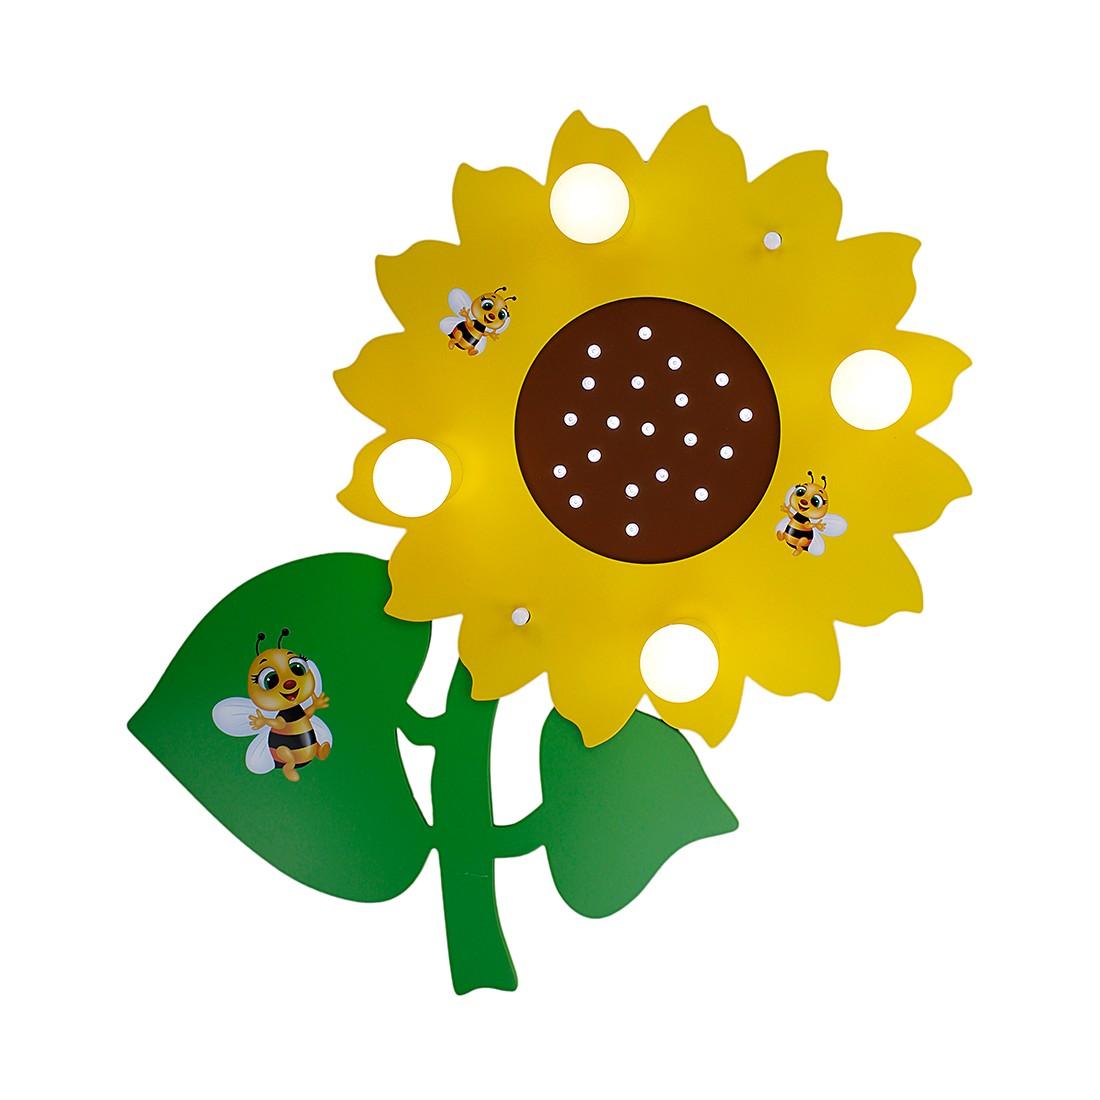 Deckenleuchte Sonnenblume 4/20 ● Holz ● 4-flammig- Elobra A+